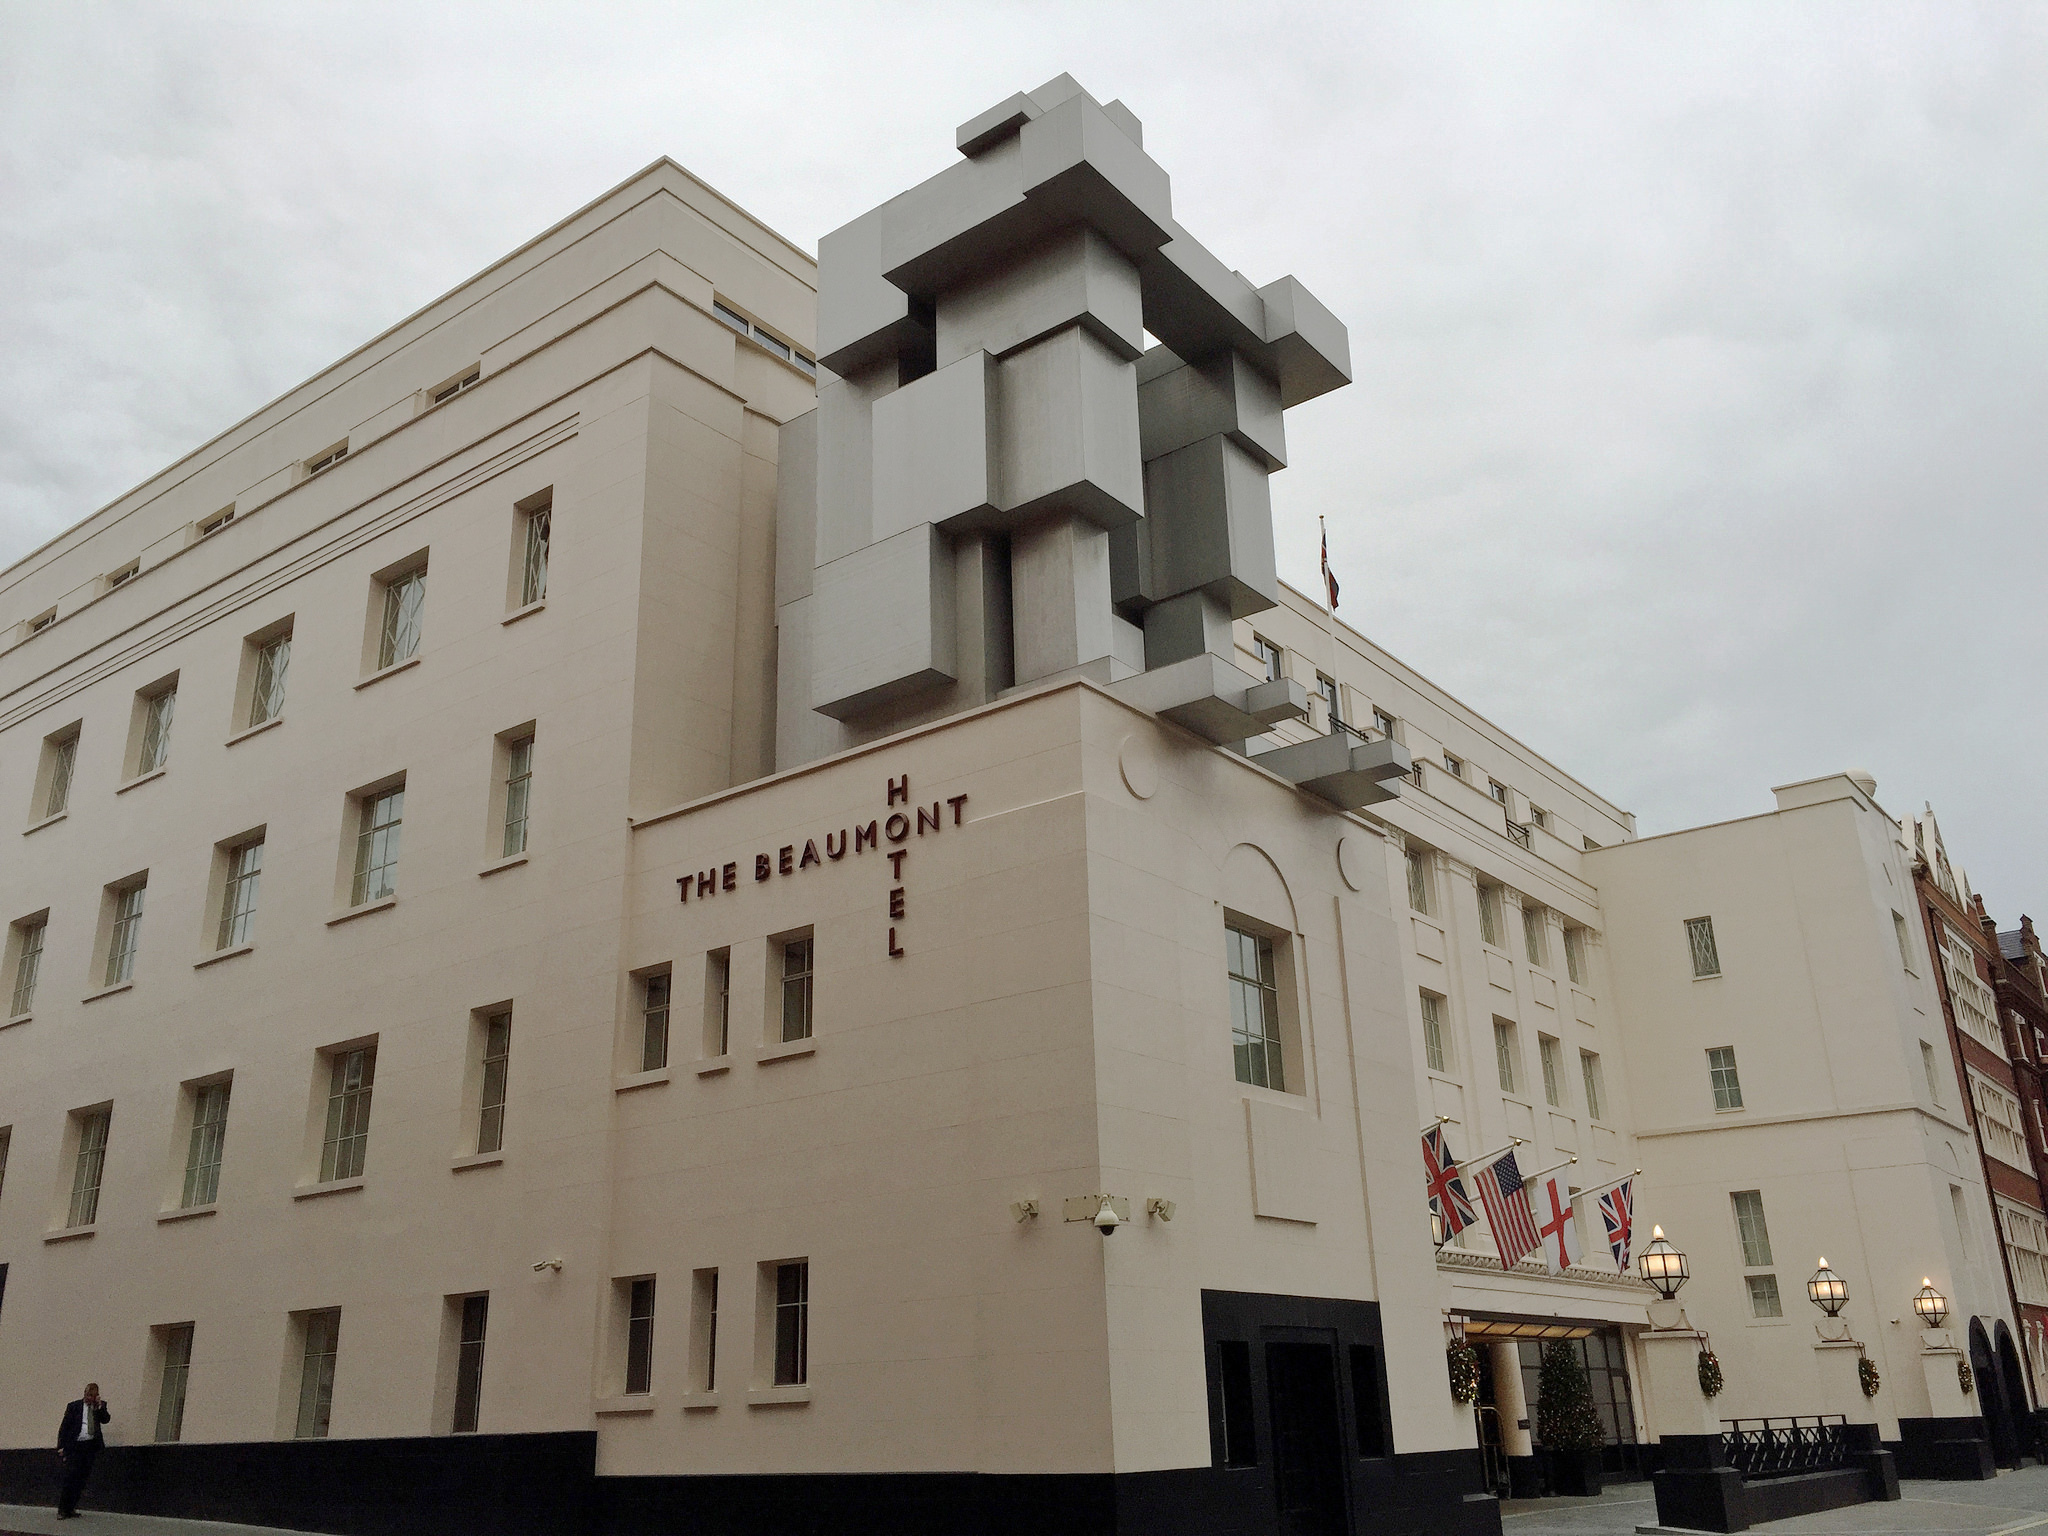 Antony Gormley, ROOM, Beaumont Hotel